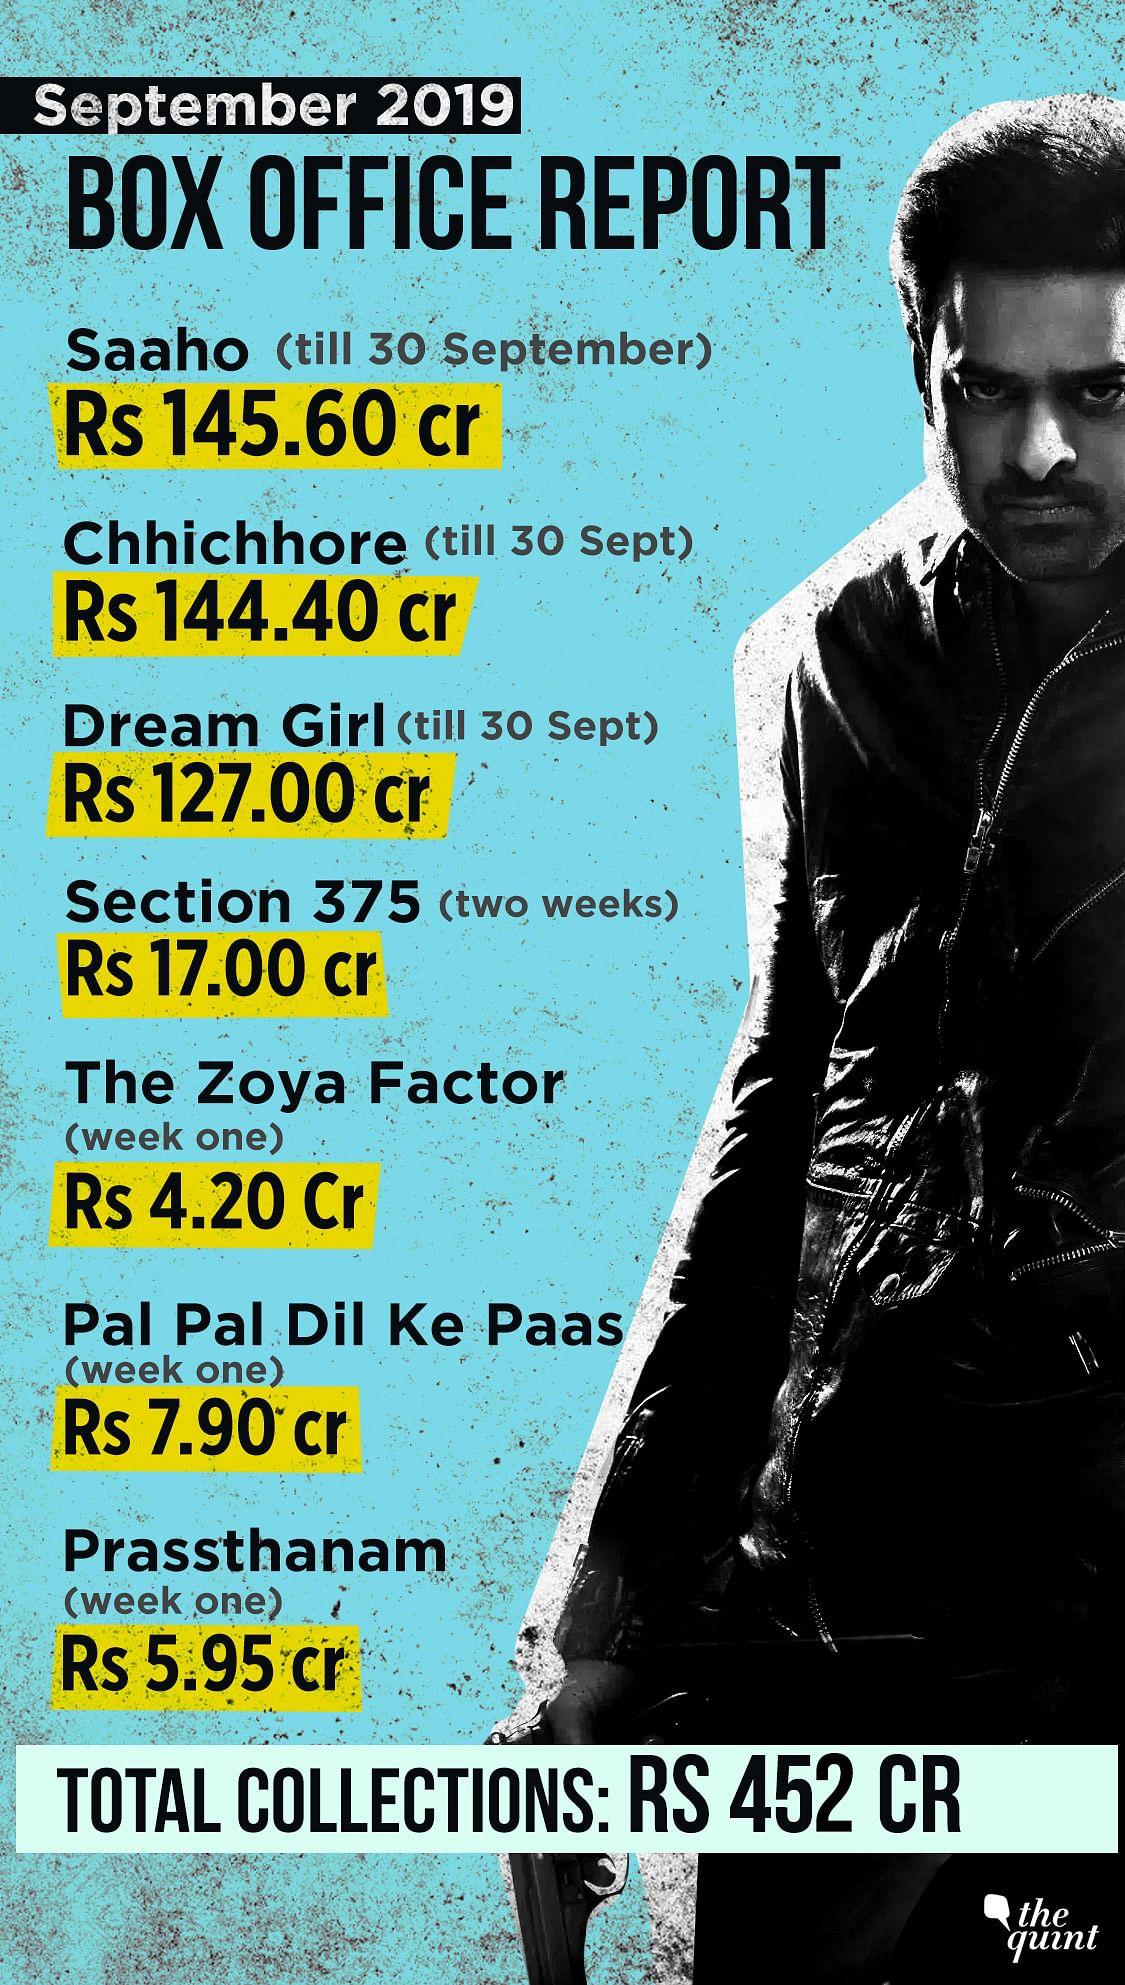 Prabhas' 'Saaho'<i> </i>(Hindi version) is the top earner in September.&nbsp;